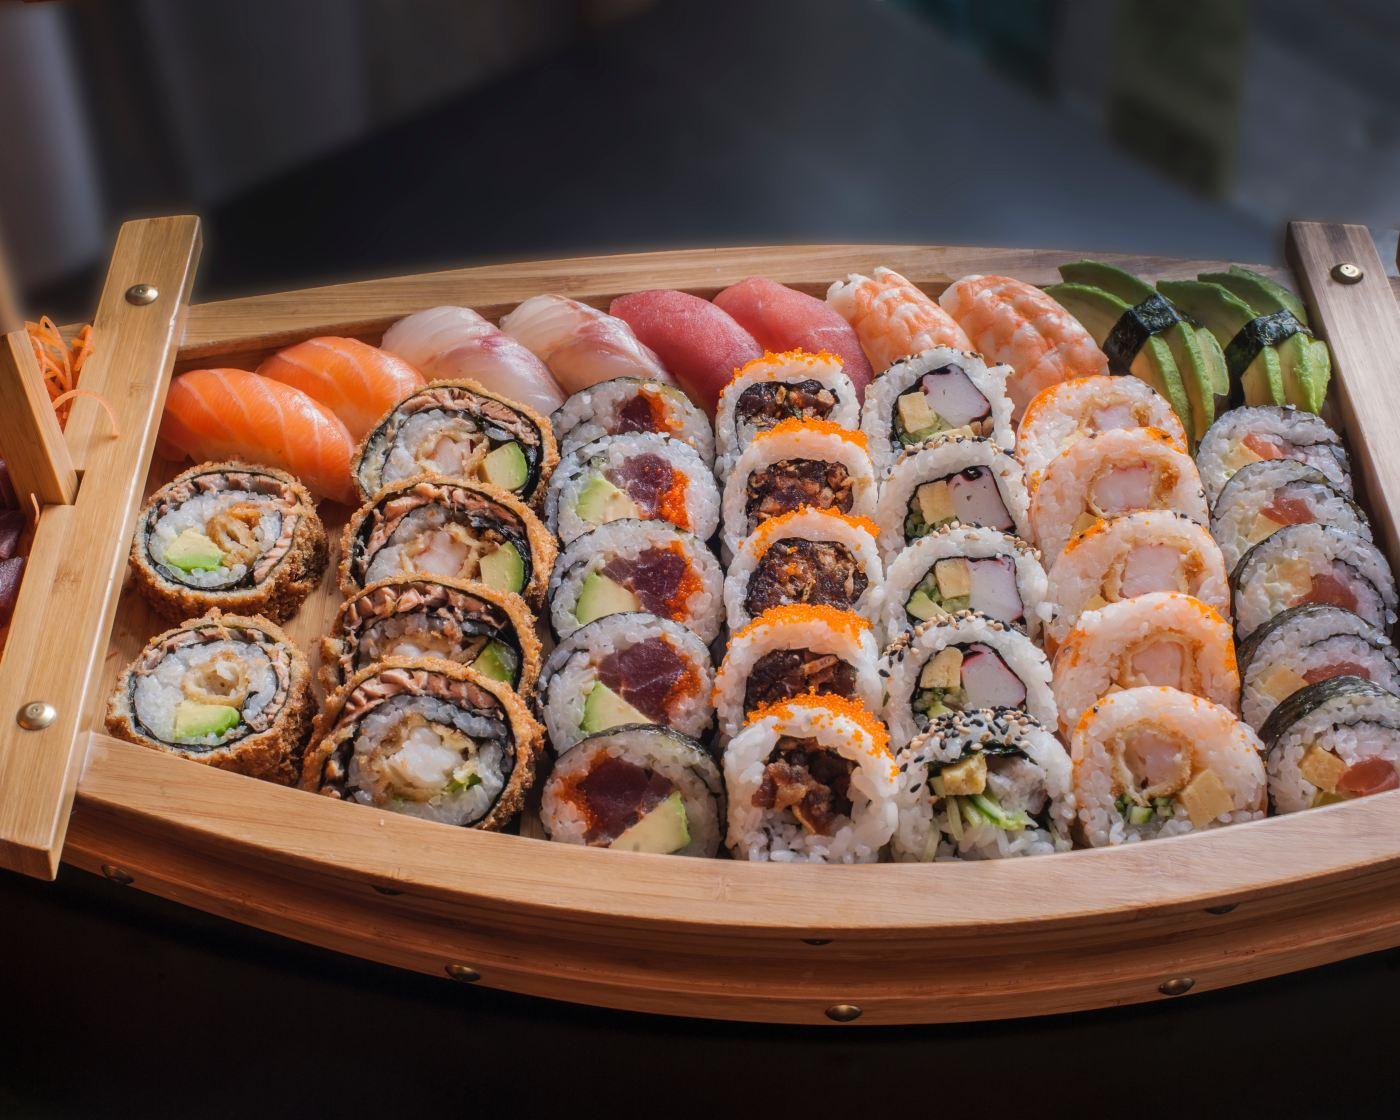 cuisine japonaise à Abidjan,kesako?, serial foodie, afroepicurien, abidjan, cote d'ivoire, restaurant japonais Abidjan